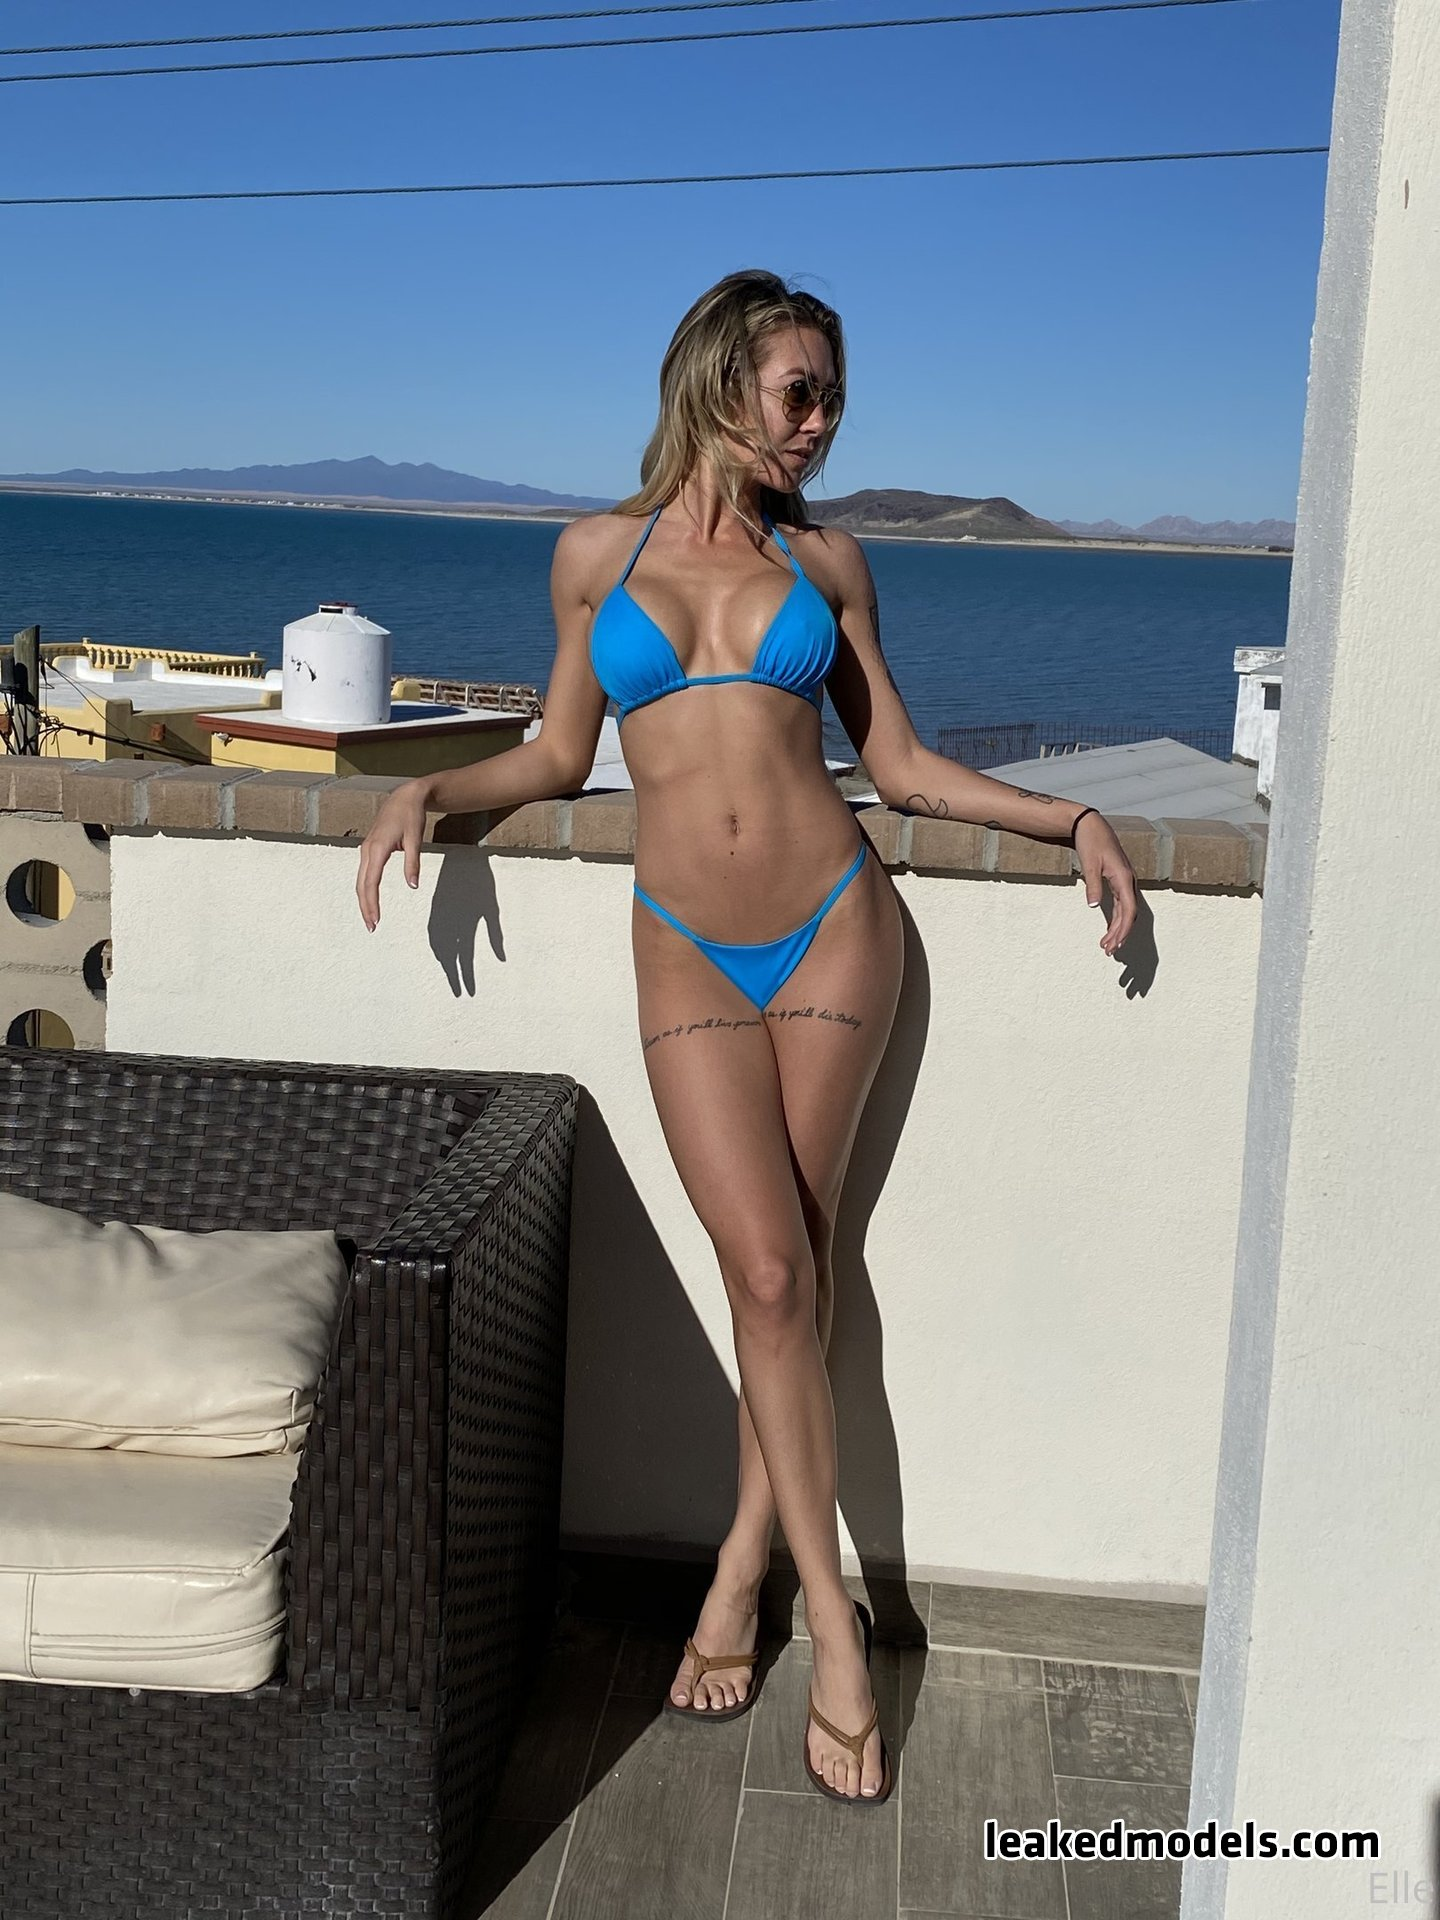 ellebelle1 leaked nude leakedmodels.com 0026 - Elle – ellebelle1 OnlyFans Nude Leaks (40 Photos)